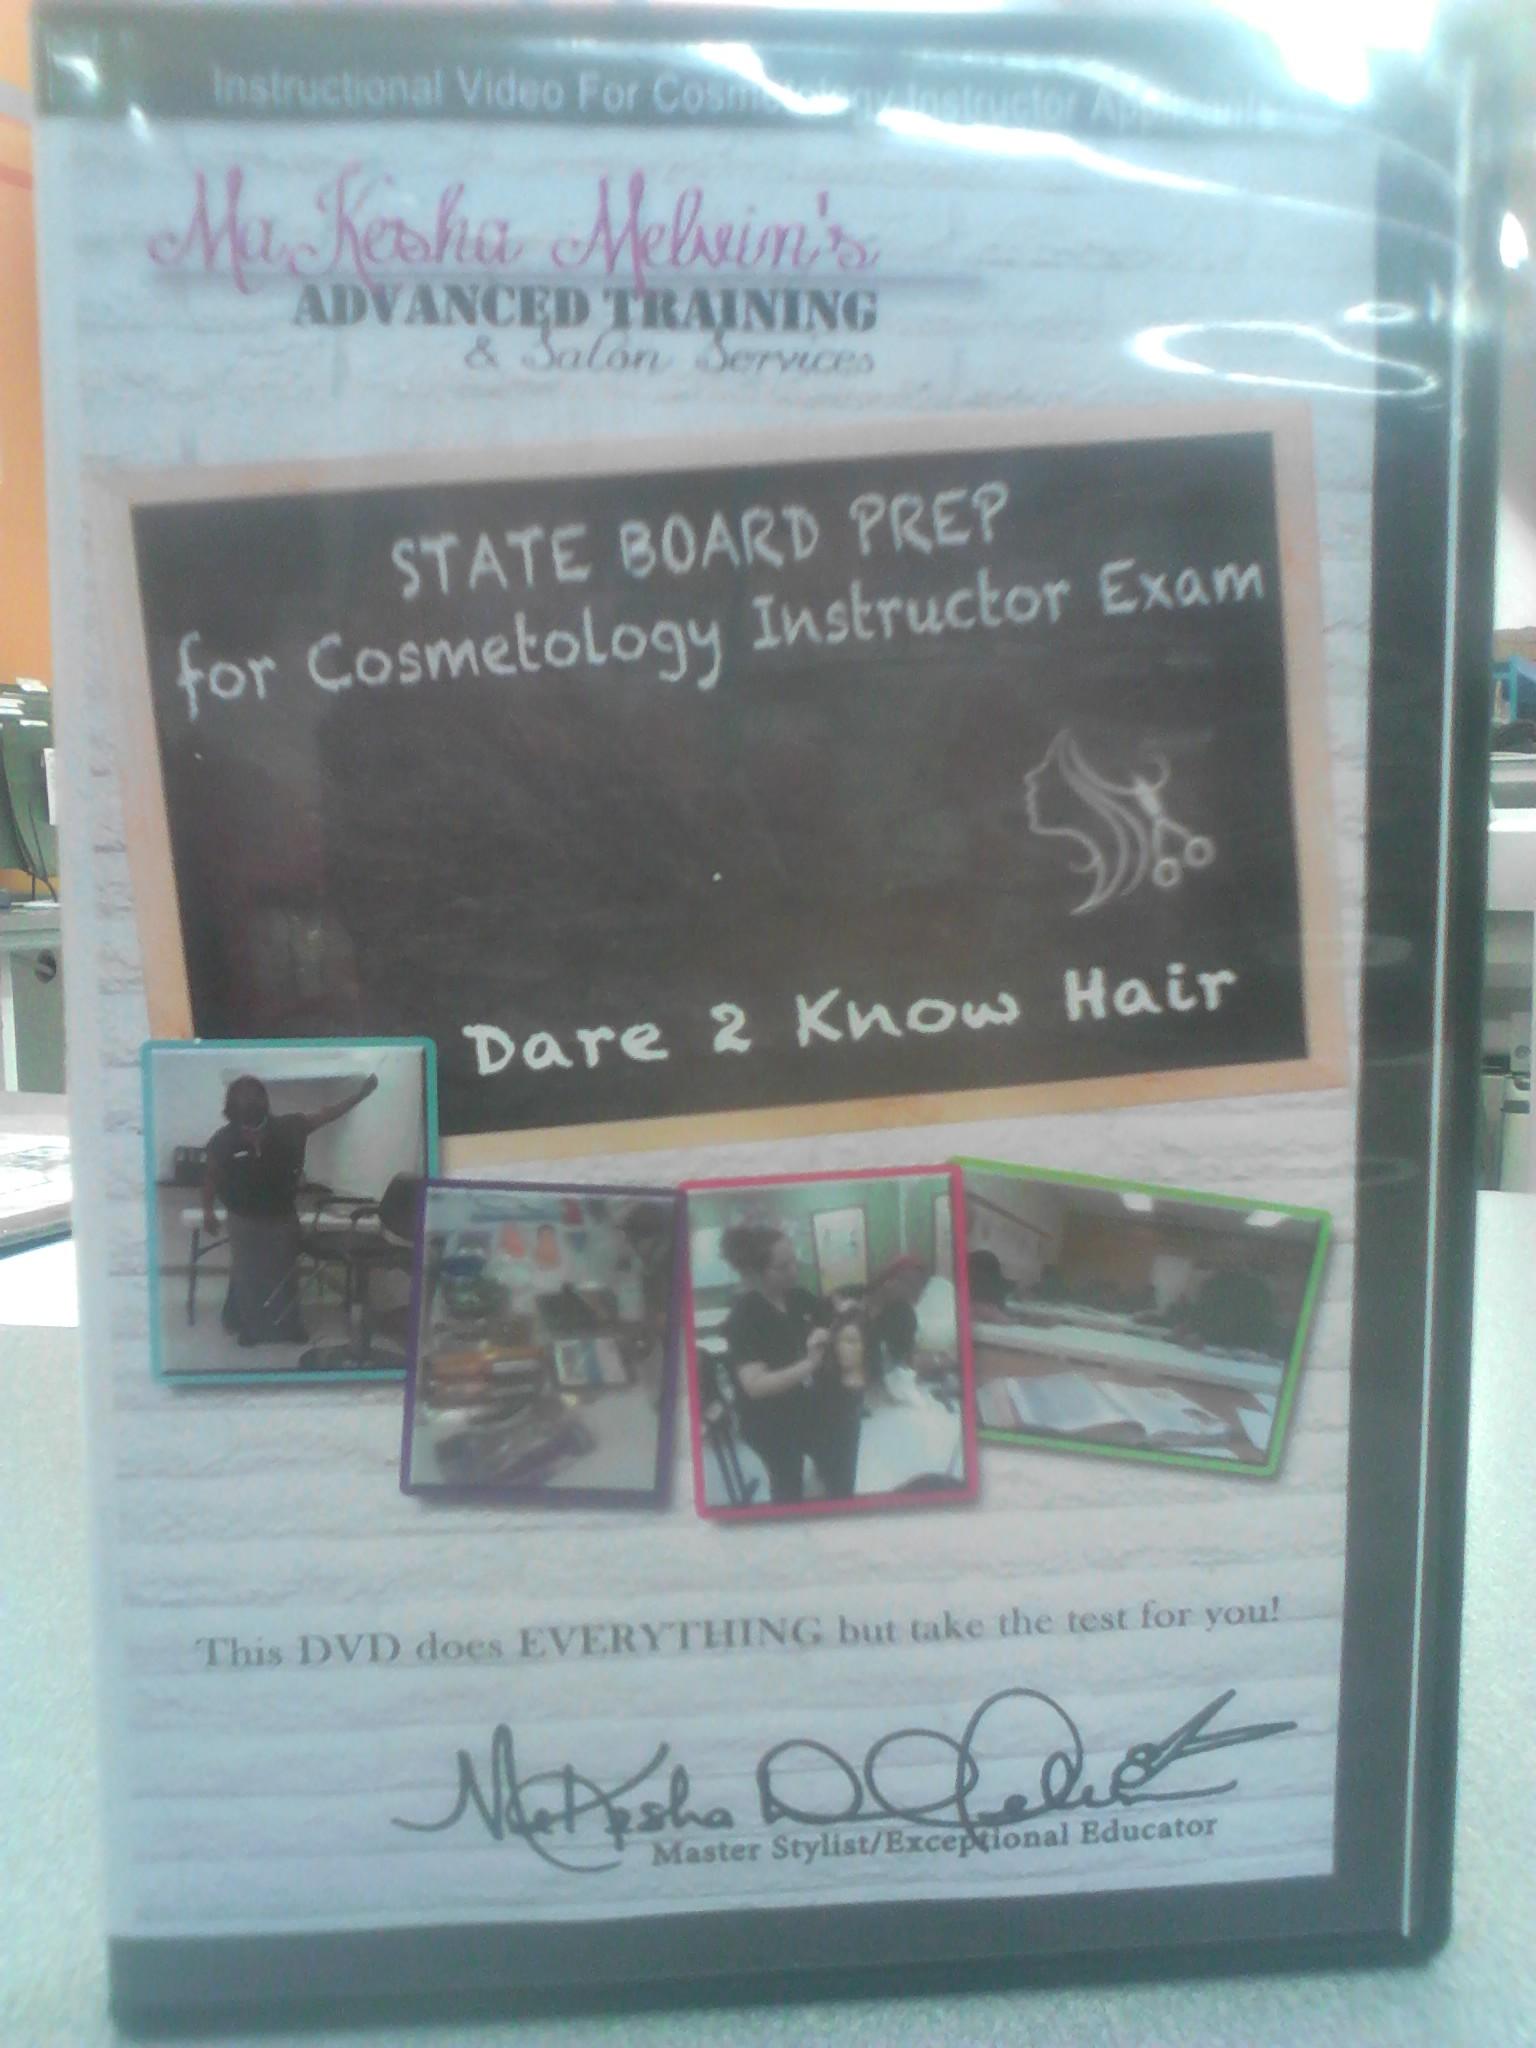 board prep dvd front cover